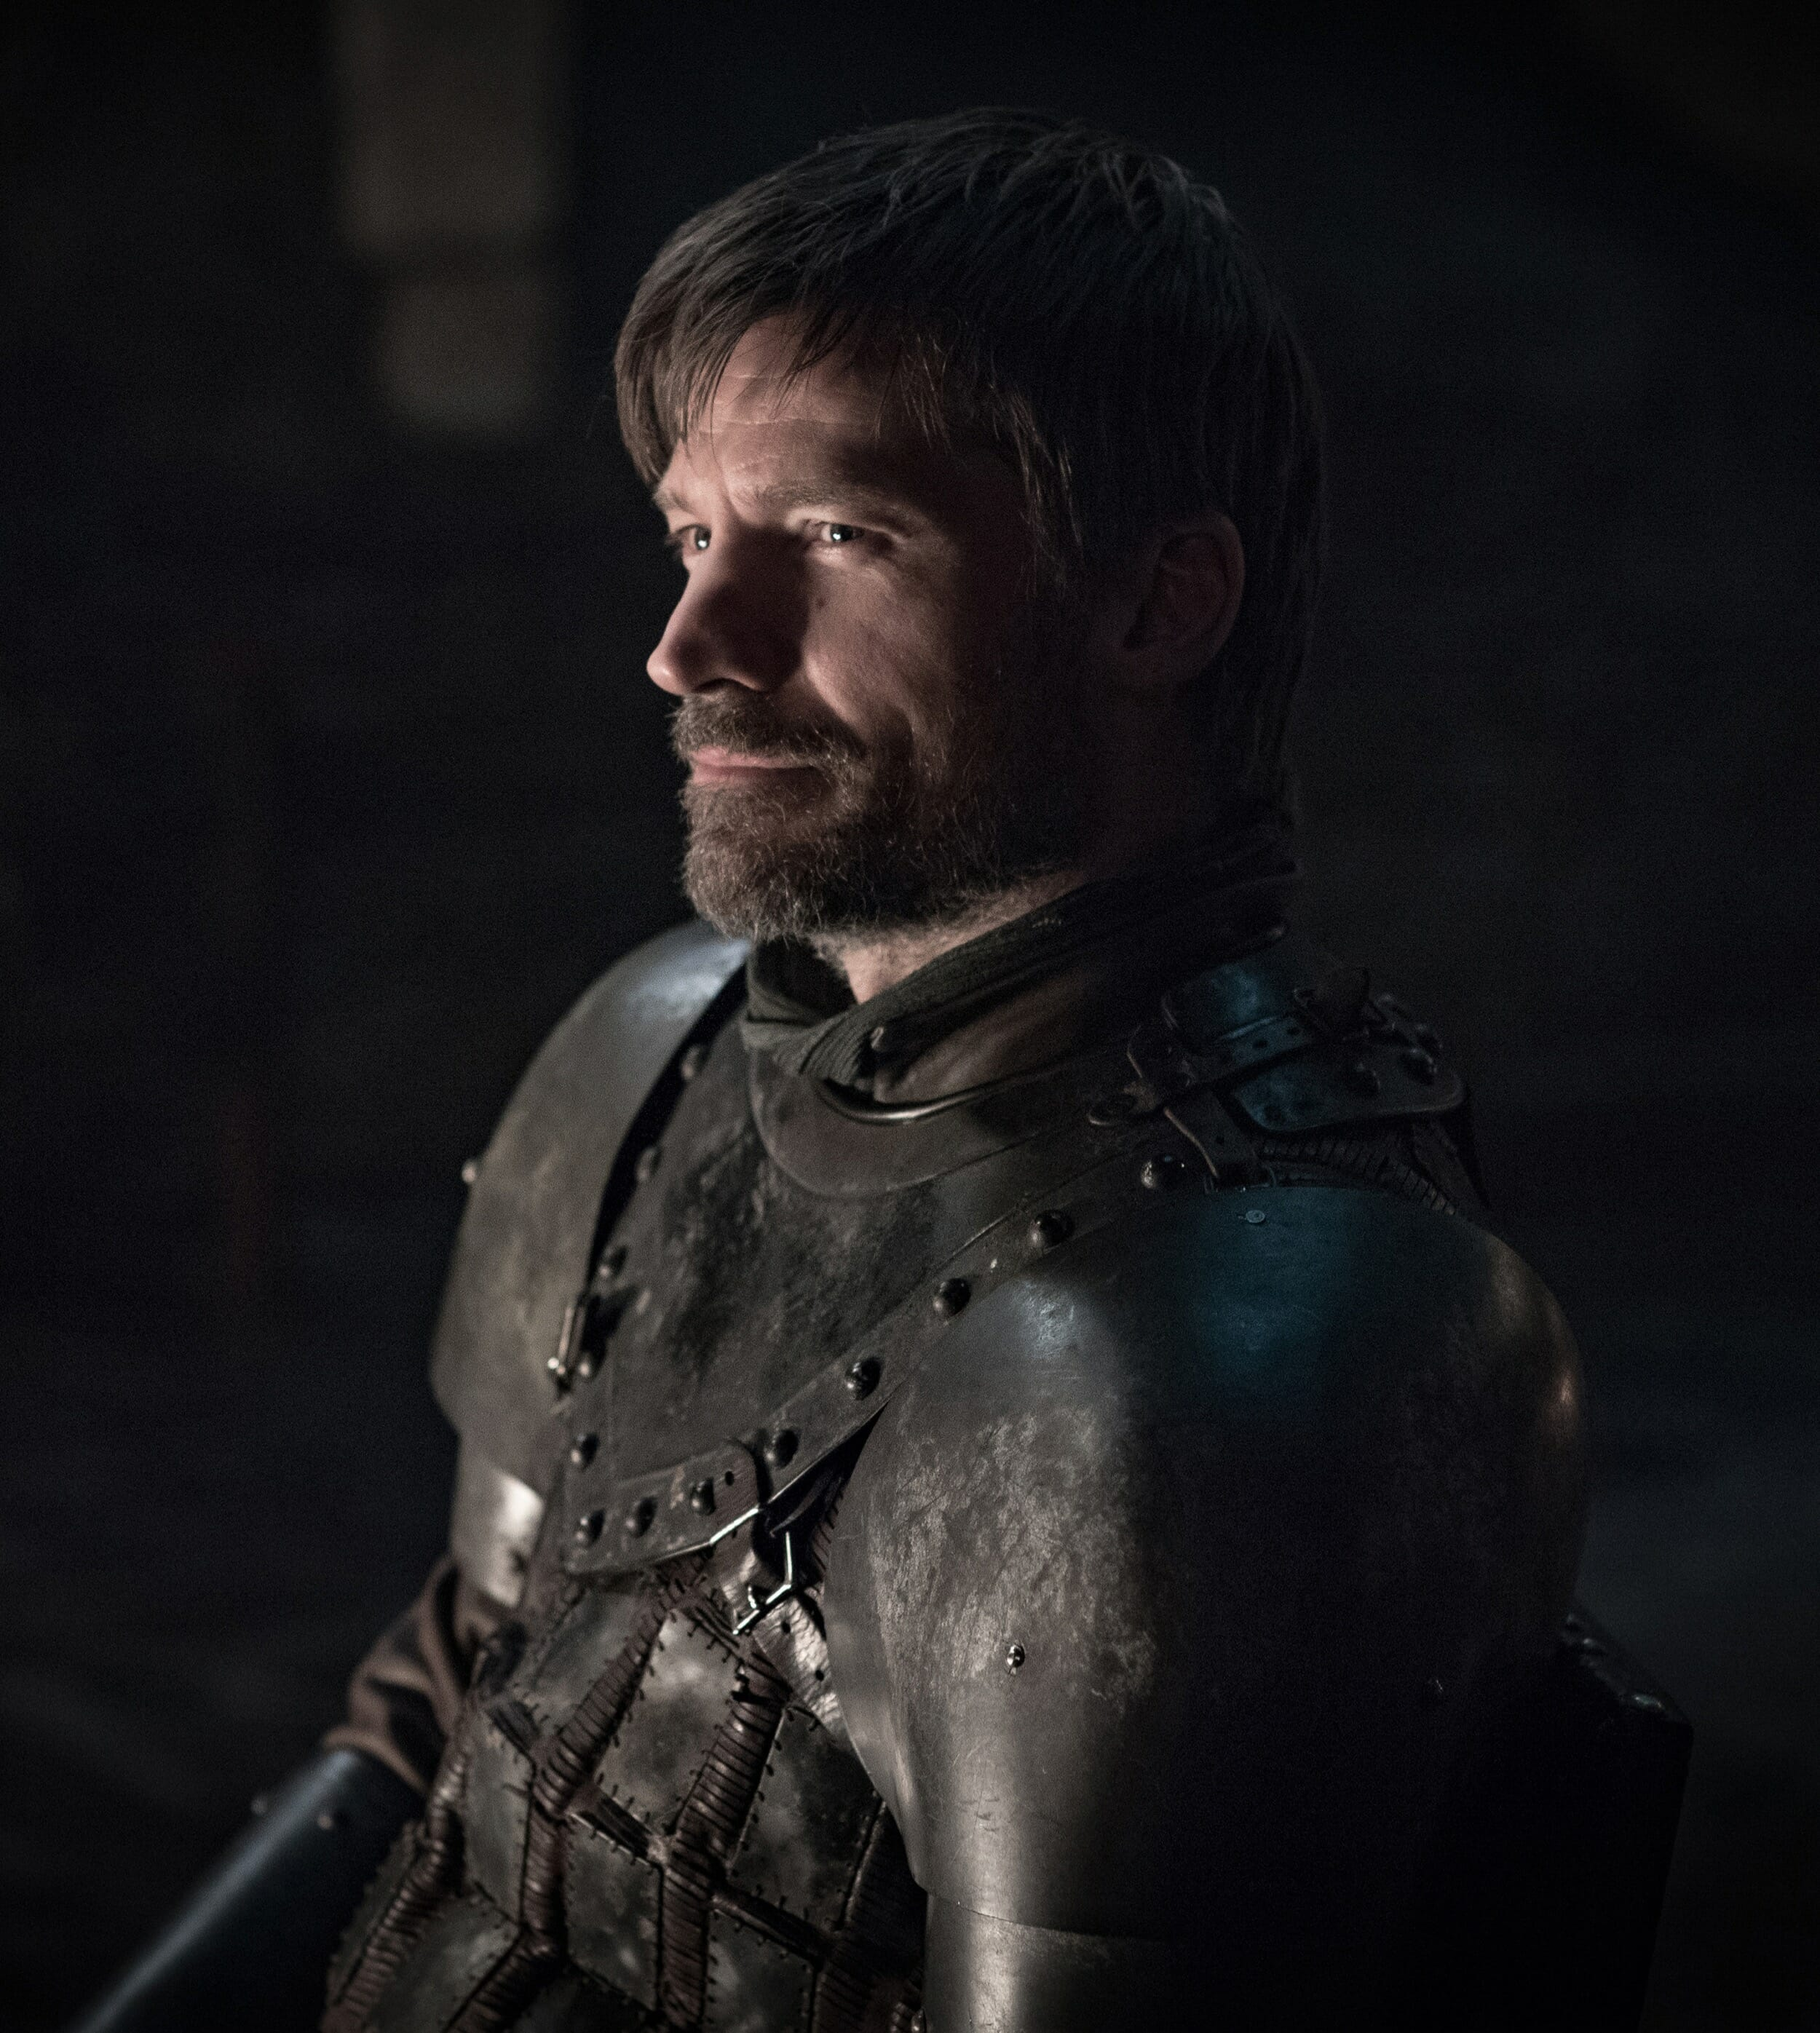 Fuck cercei lannister pov